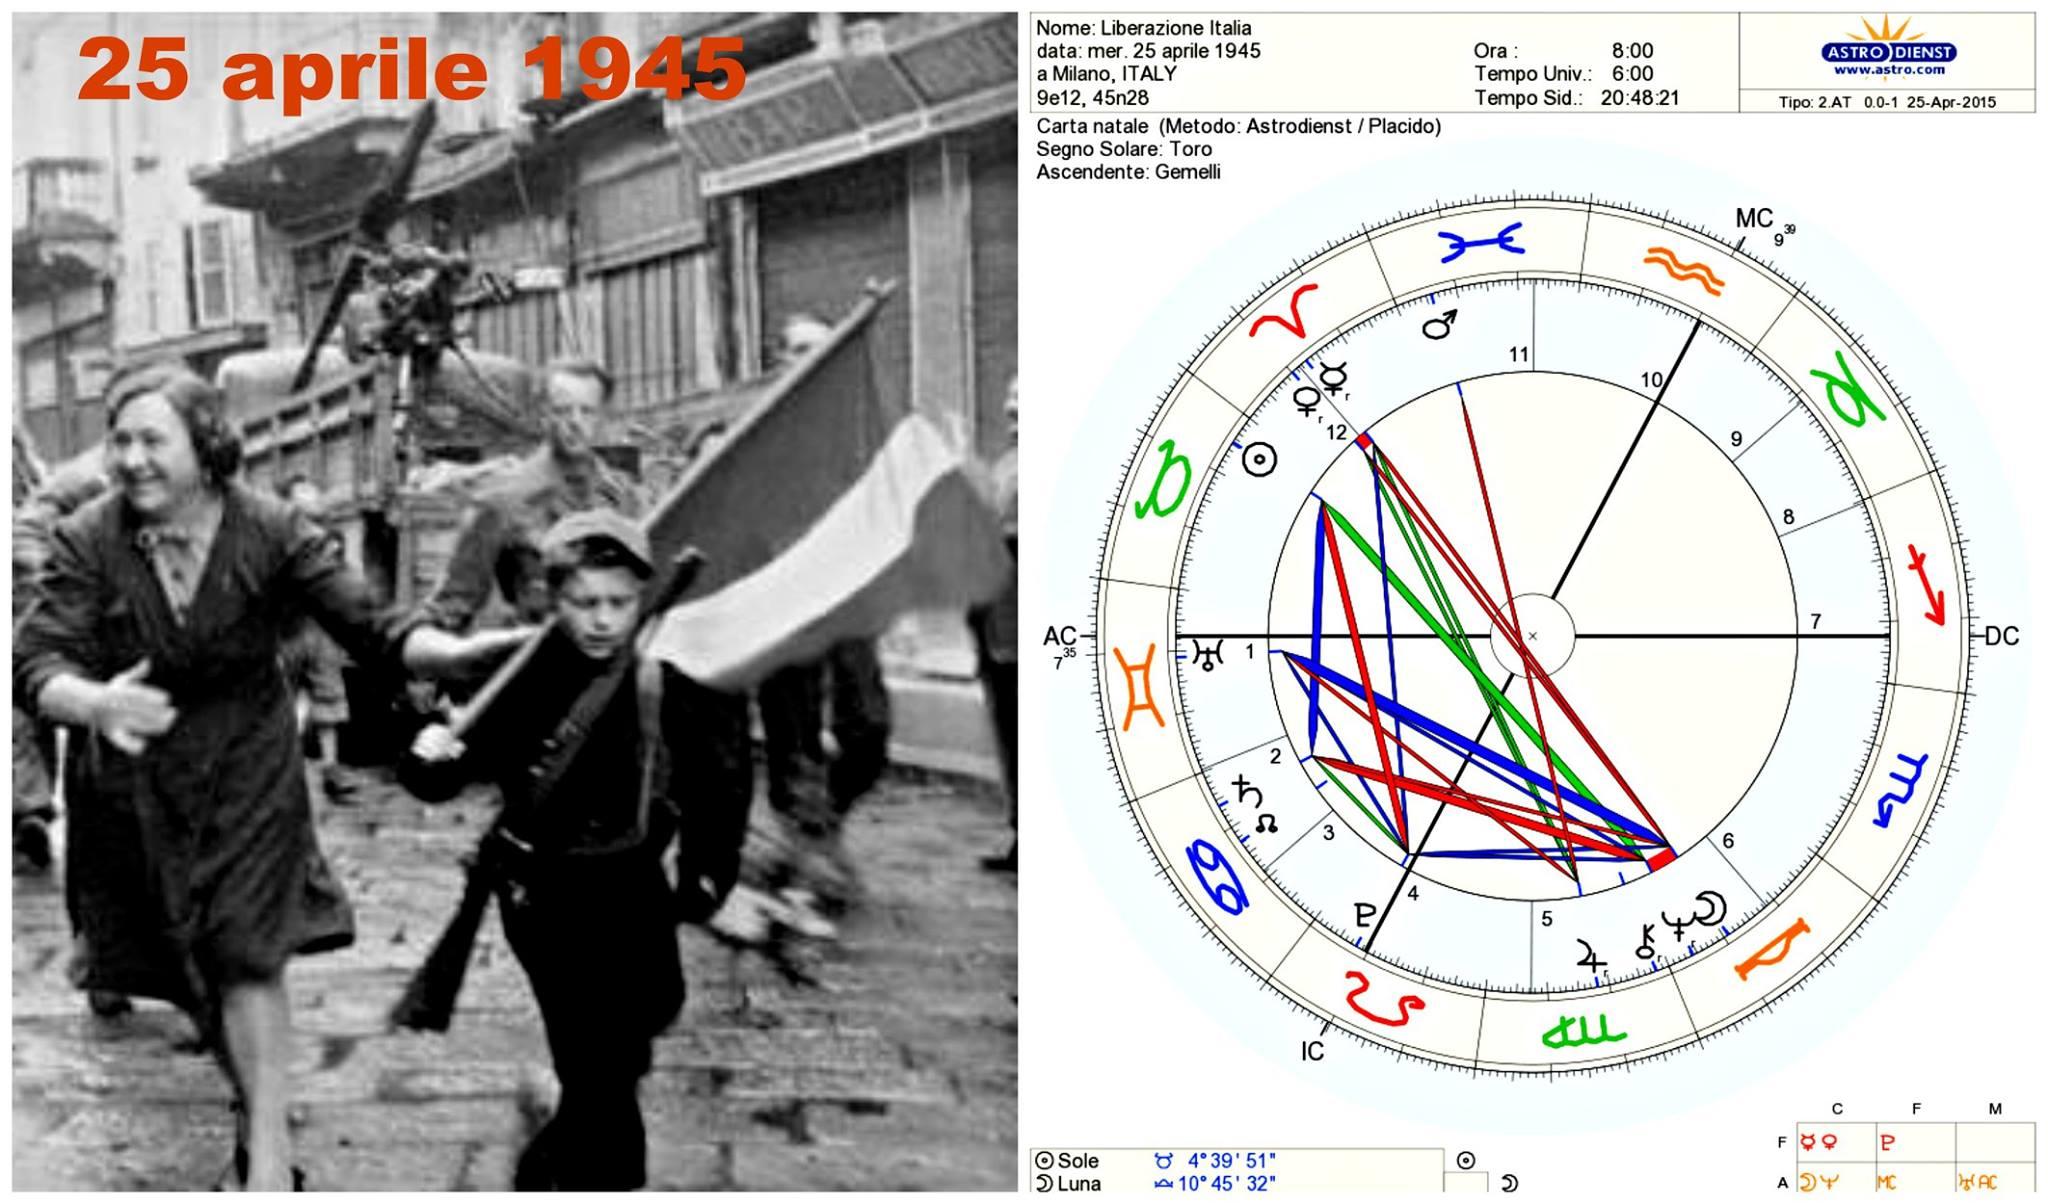 25 aprile 1945 - photo #34